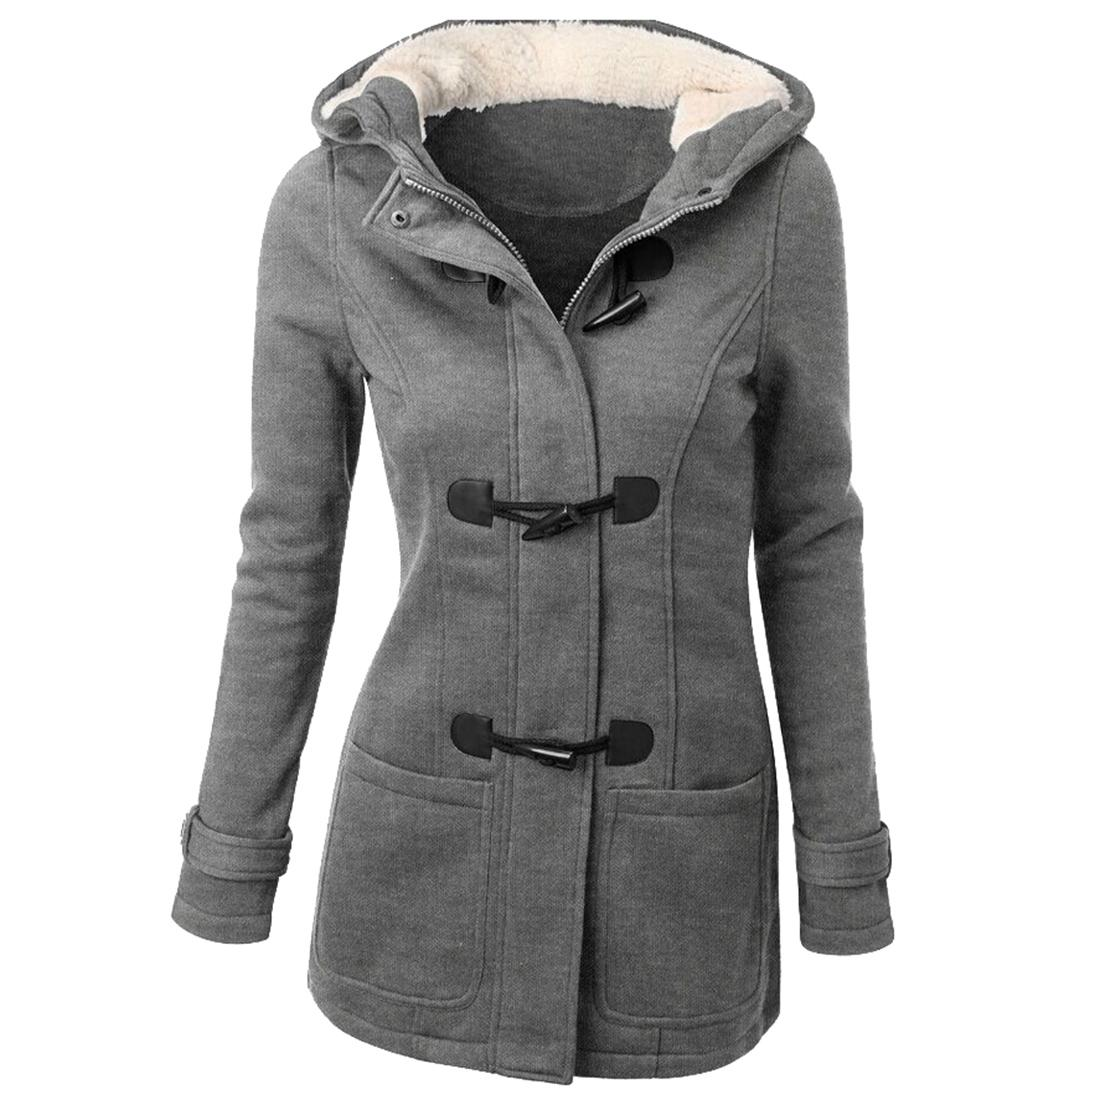 Capa Mujer Trench De Compre Abrigo Primavera Coat Otoño d0RwtxqPt